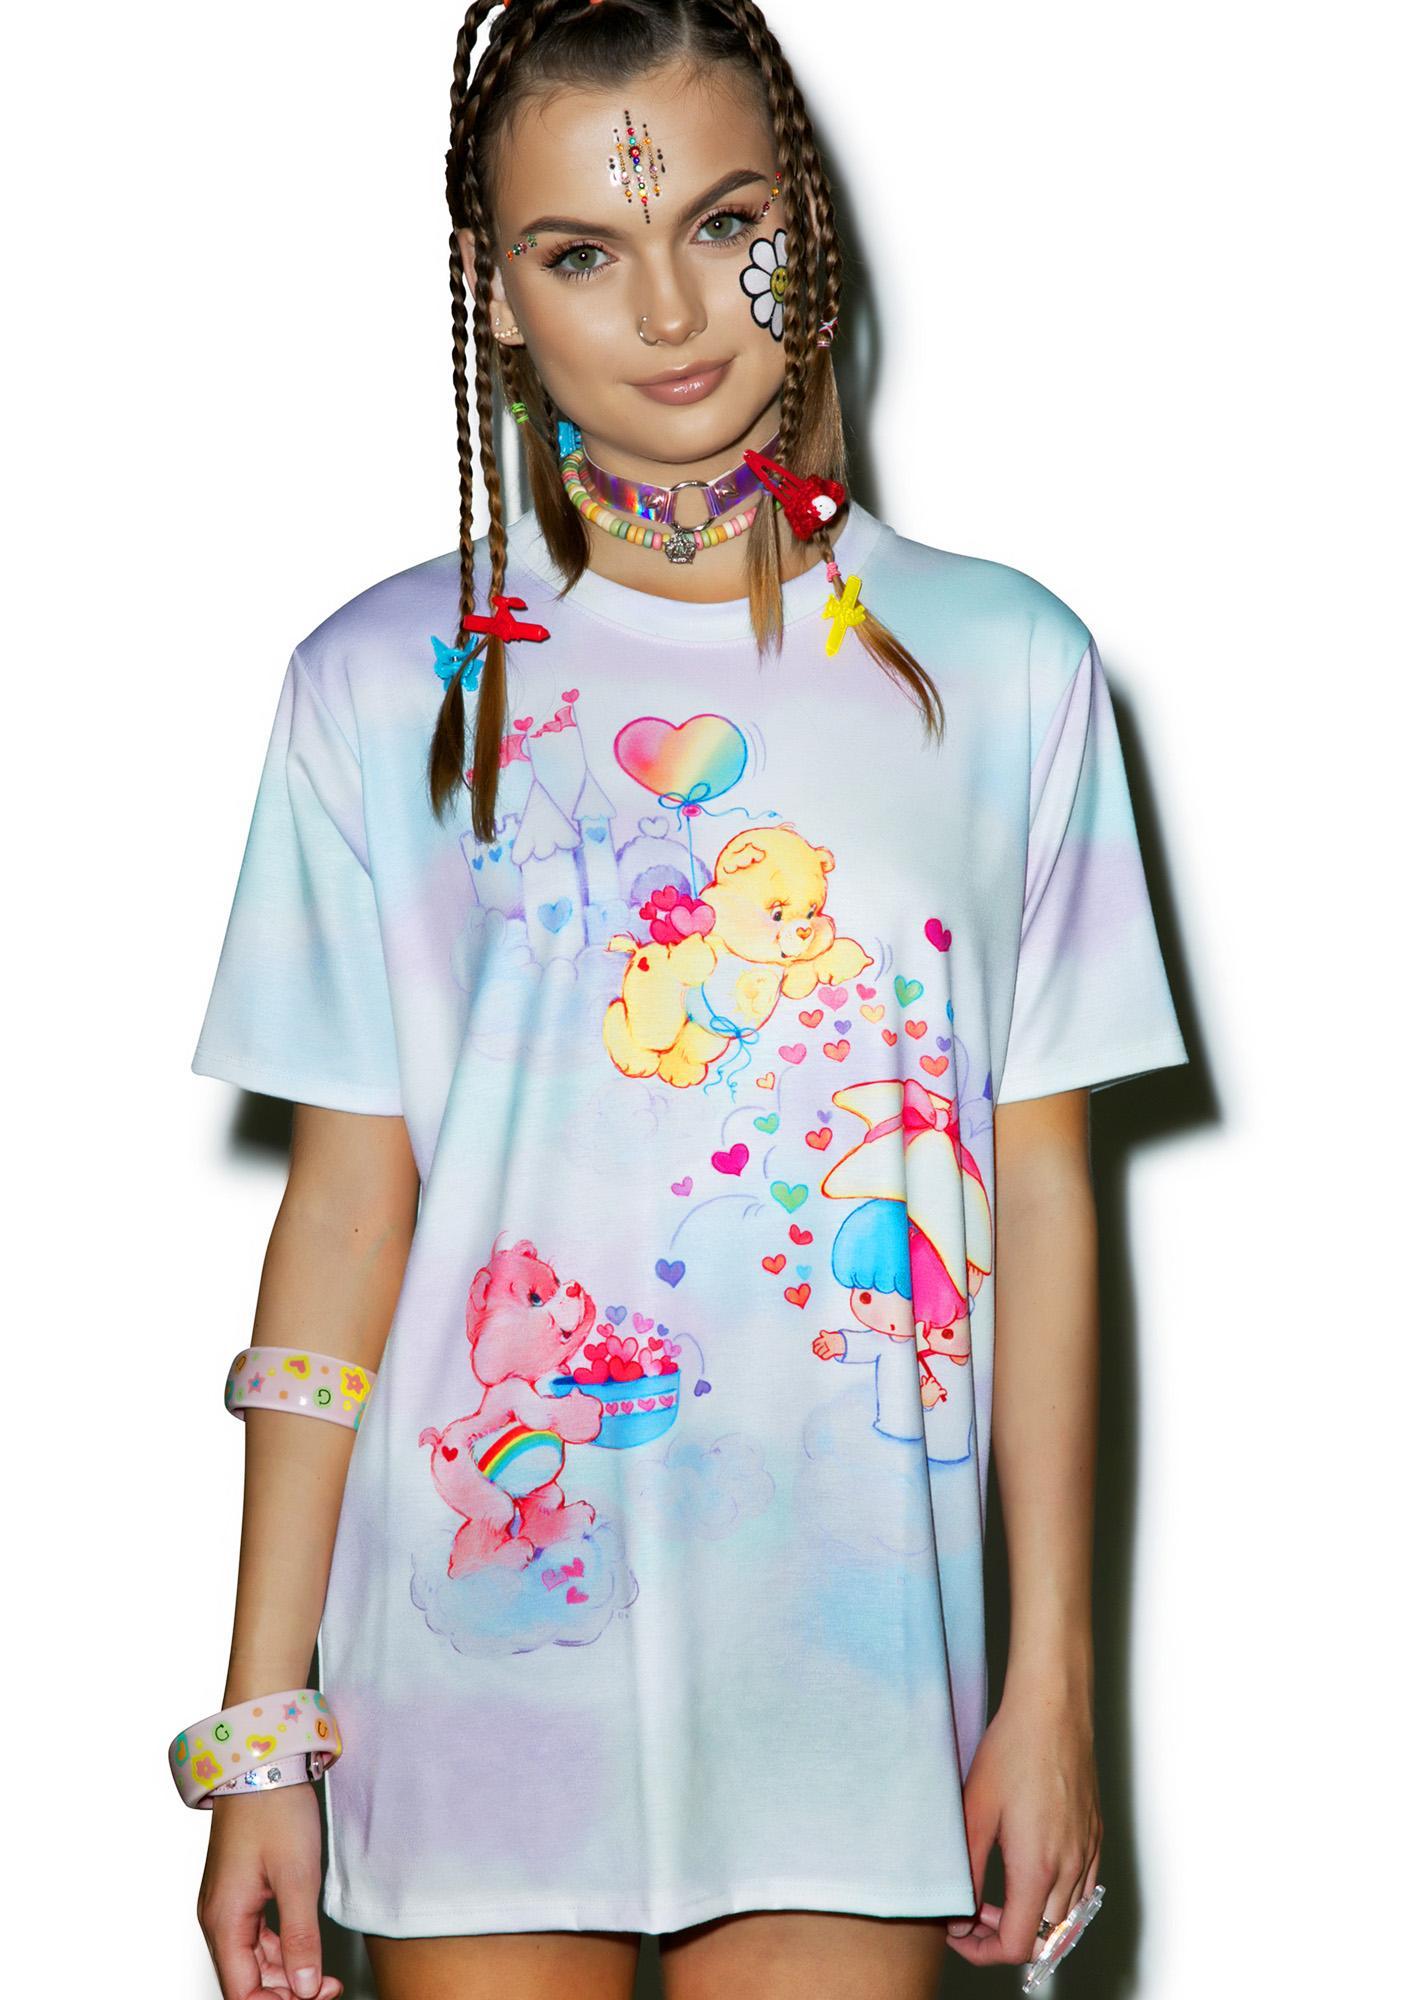 Japan L.A. Little Twin Stars X Care Bears Cloudy Dream Top